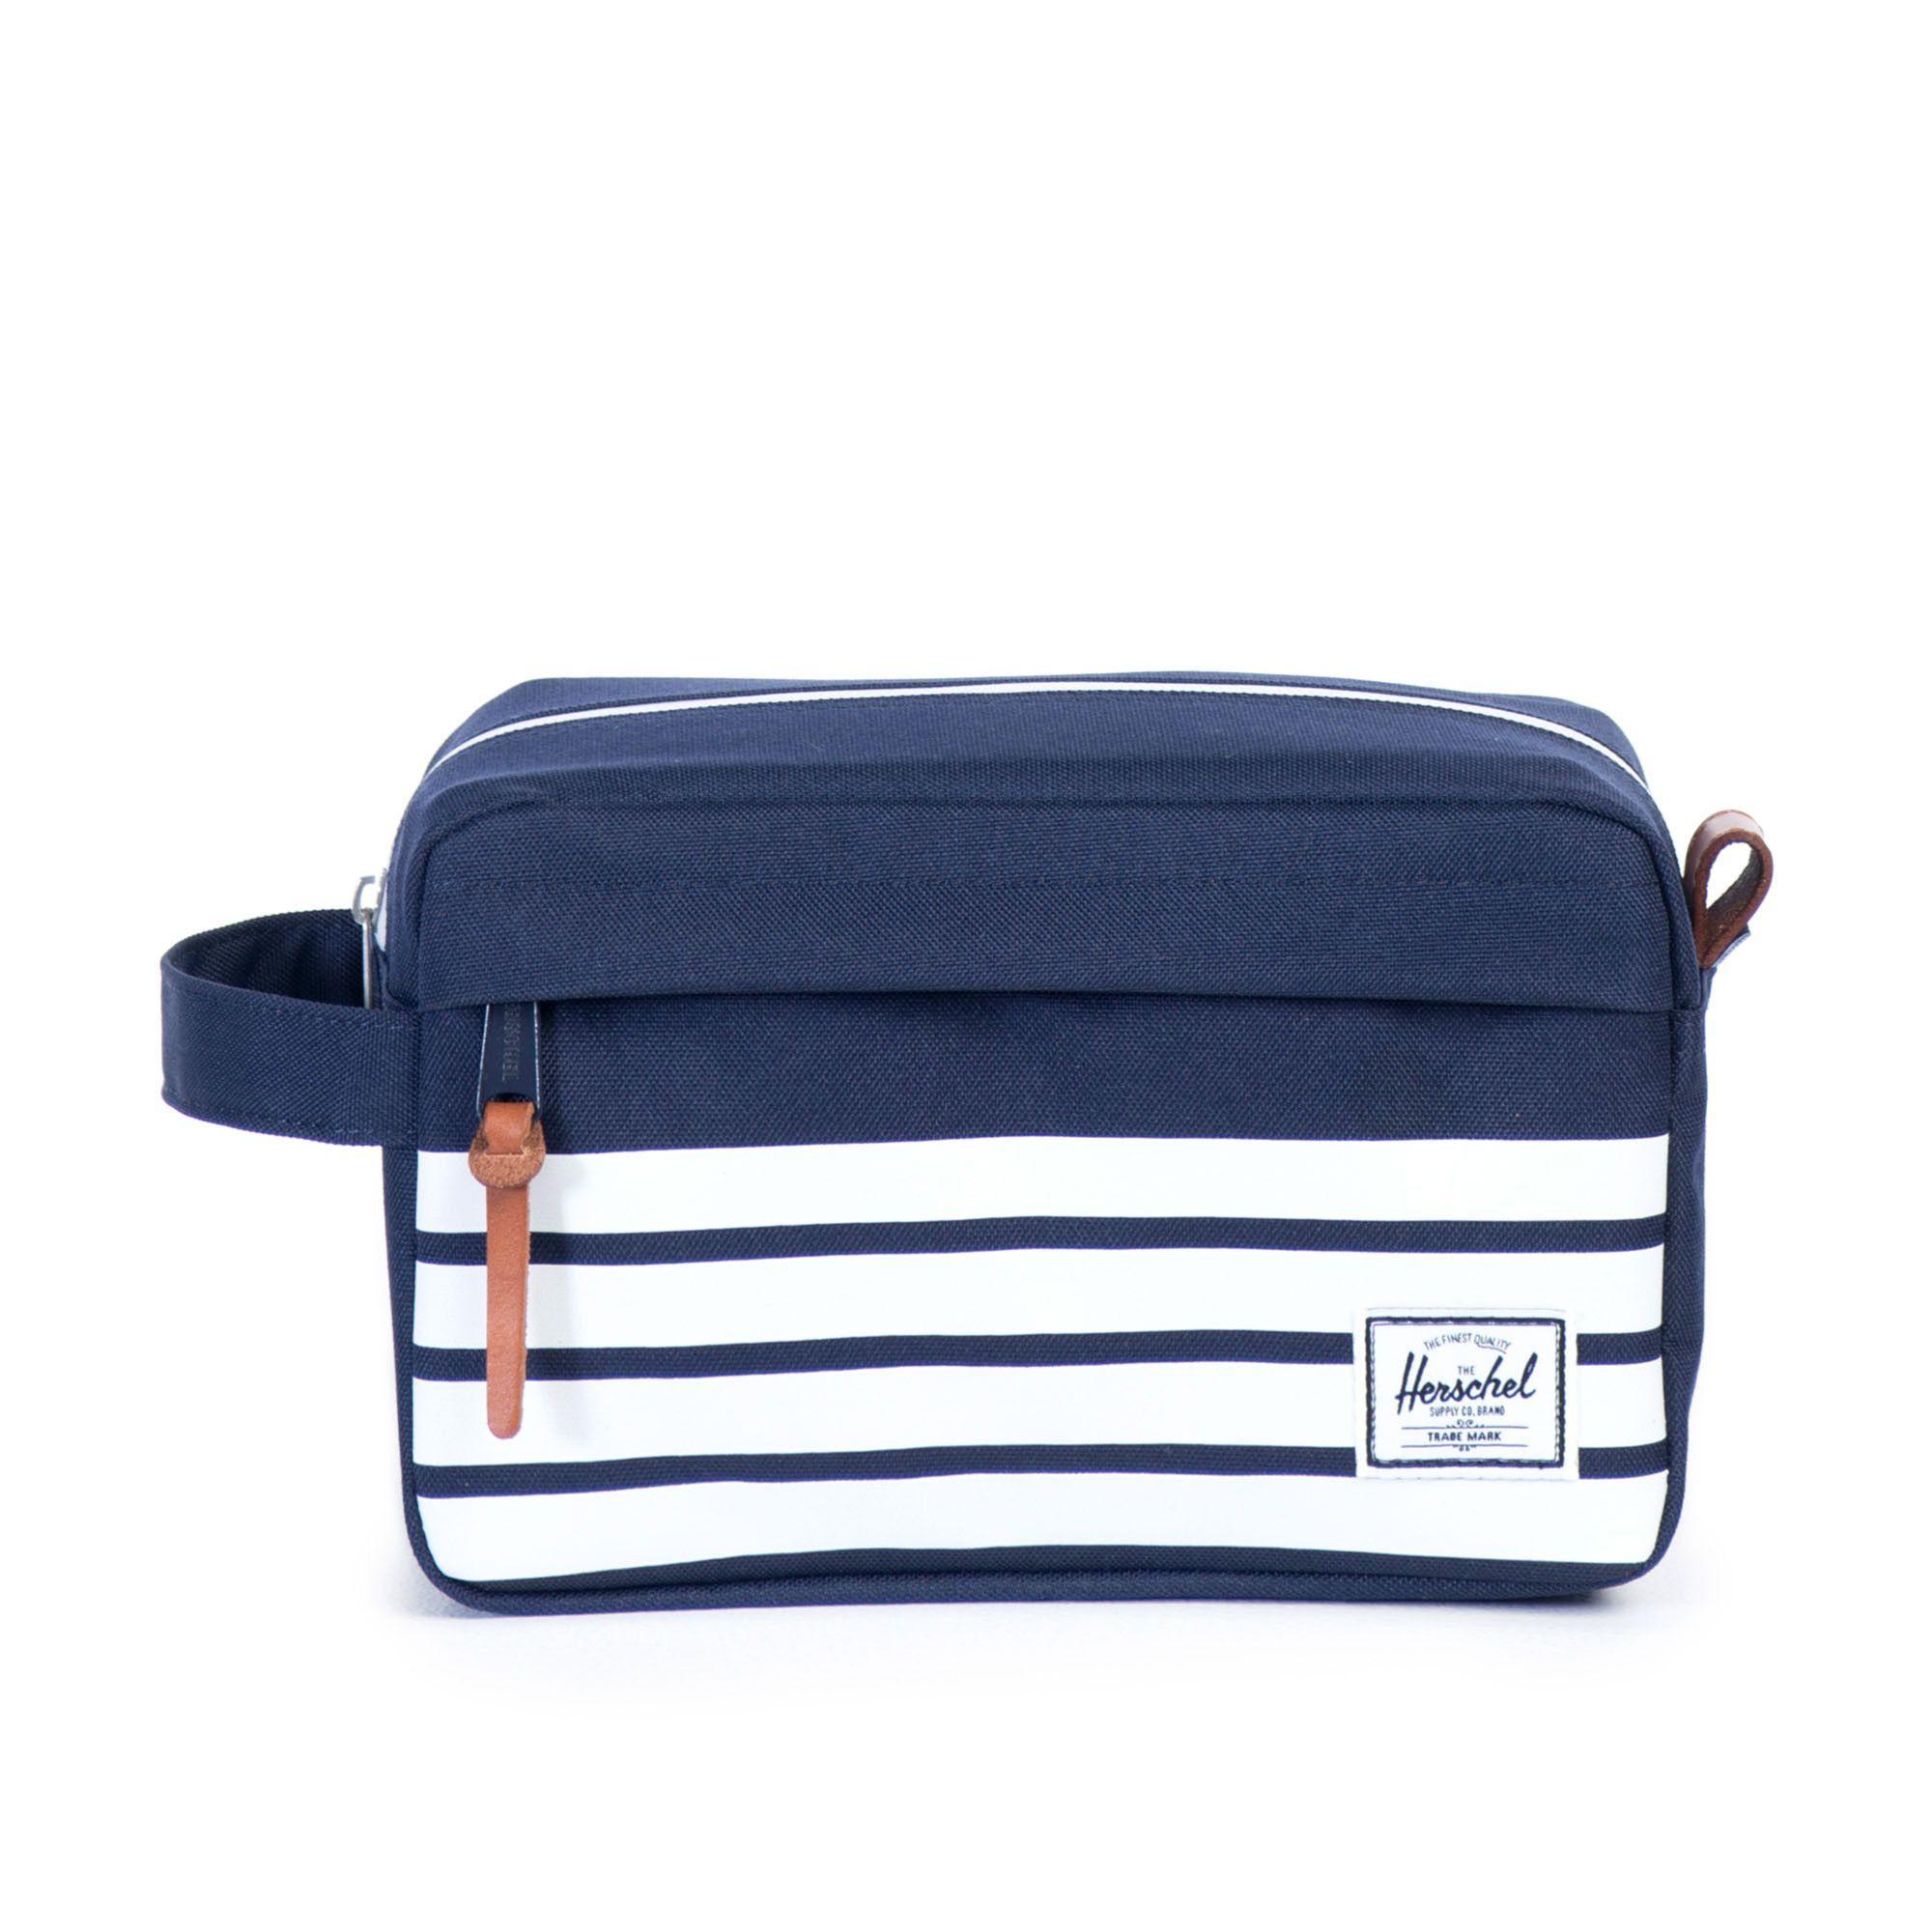 c0a0f9adb65 Chapter Navy. Chapter Navy Travel Kits, Travel Bag, Herschel Supply Co ...